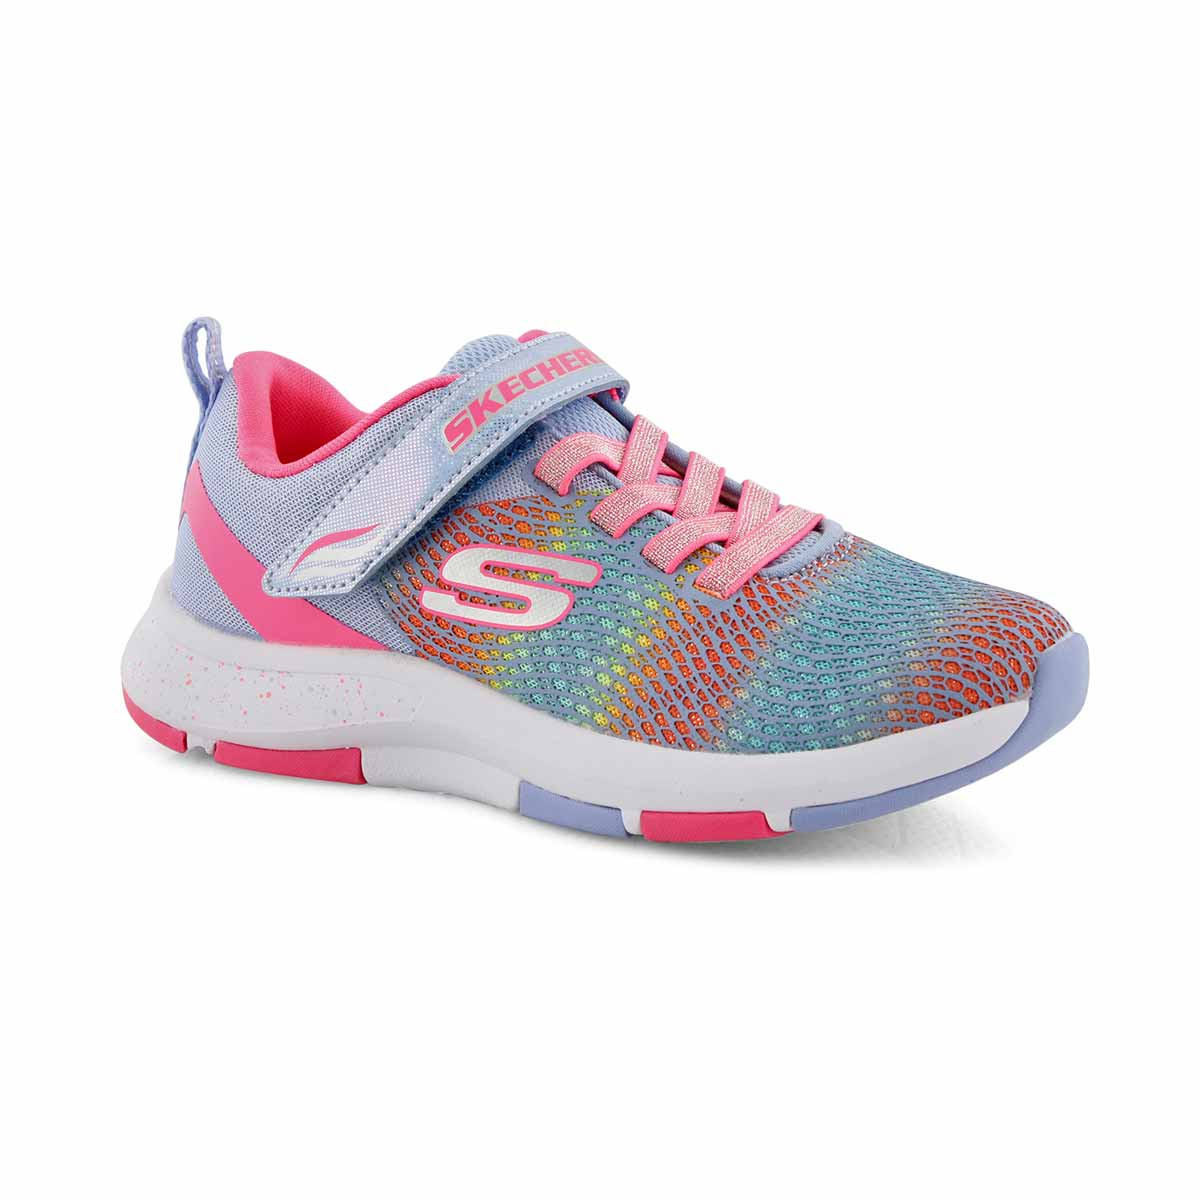 Grls Trainer Lite 2.0 blu/pnk sneaker